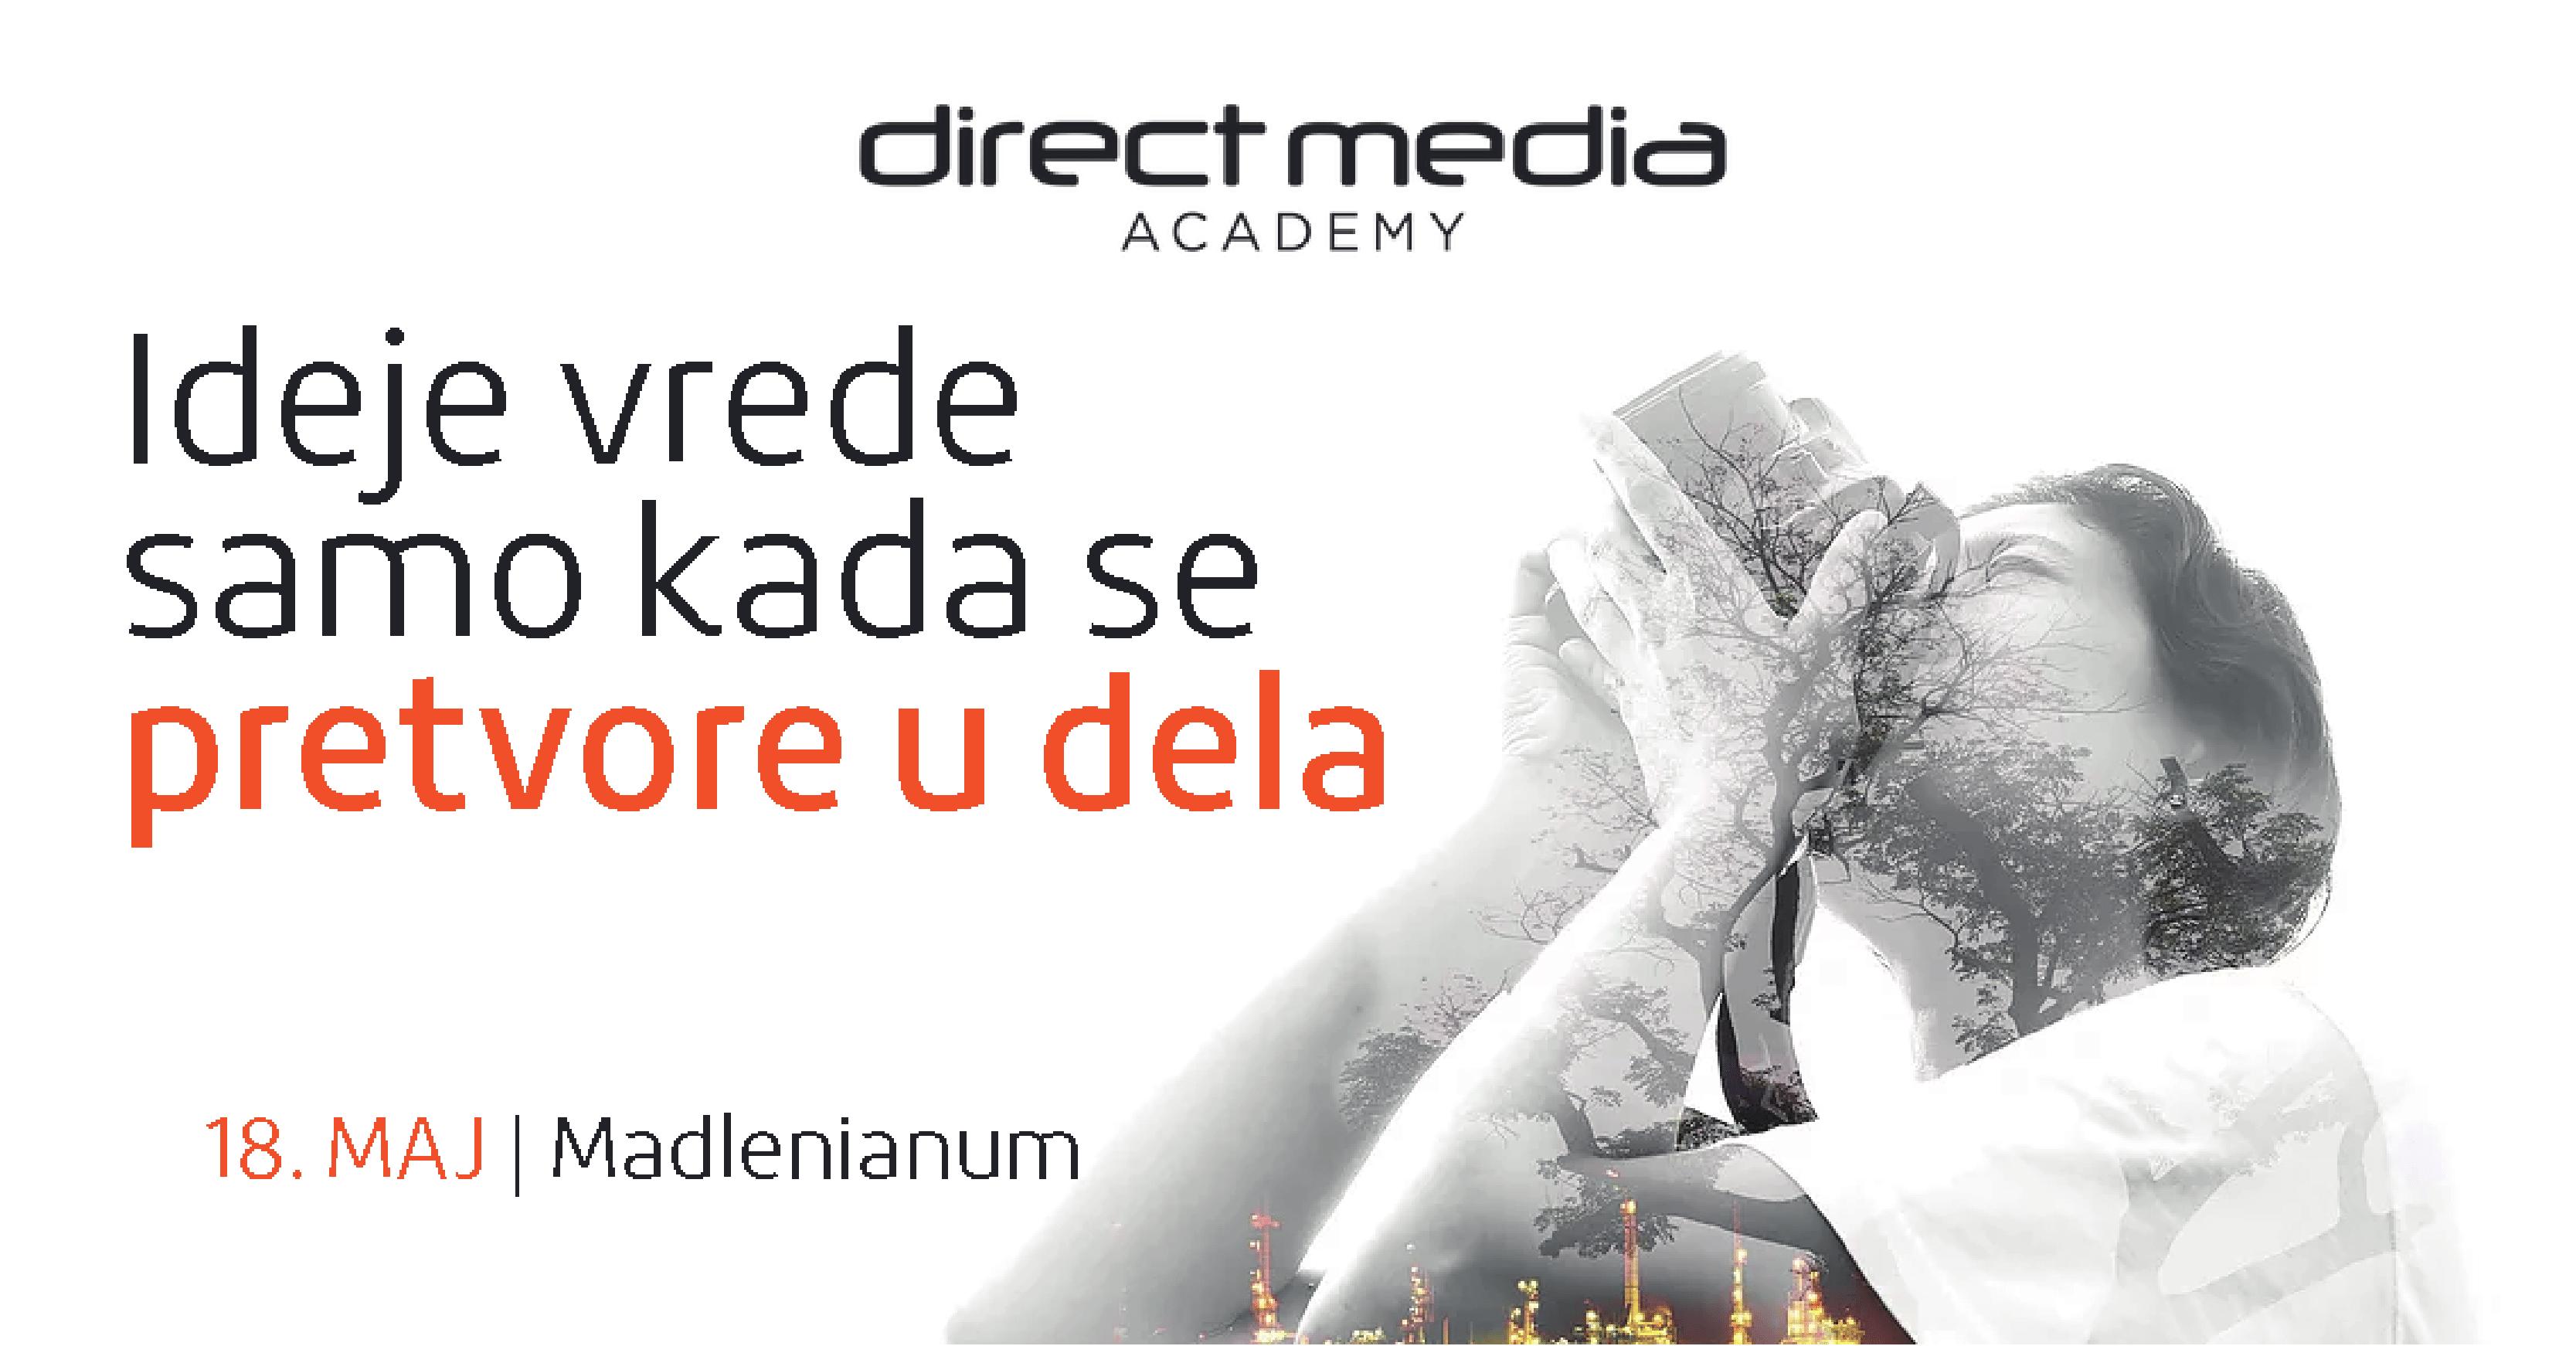 direct media-1